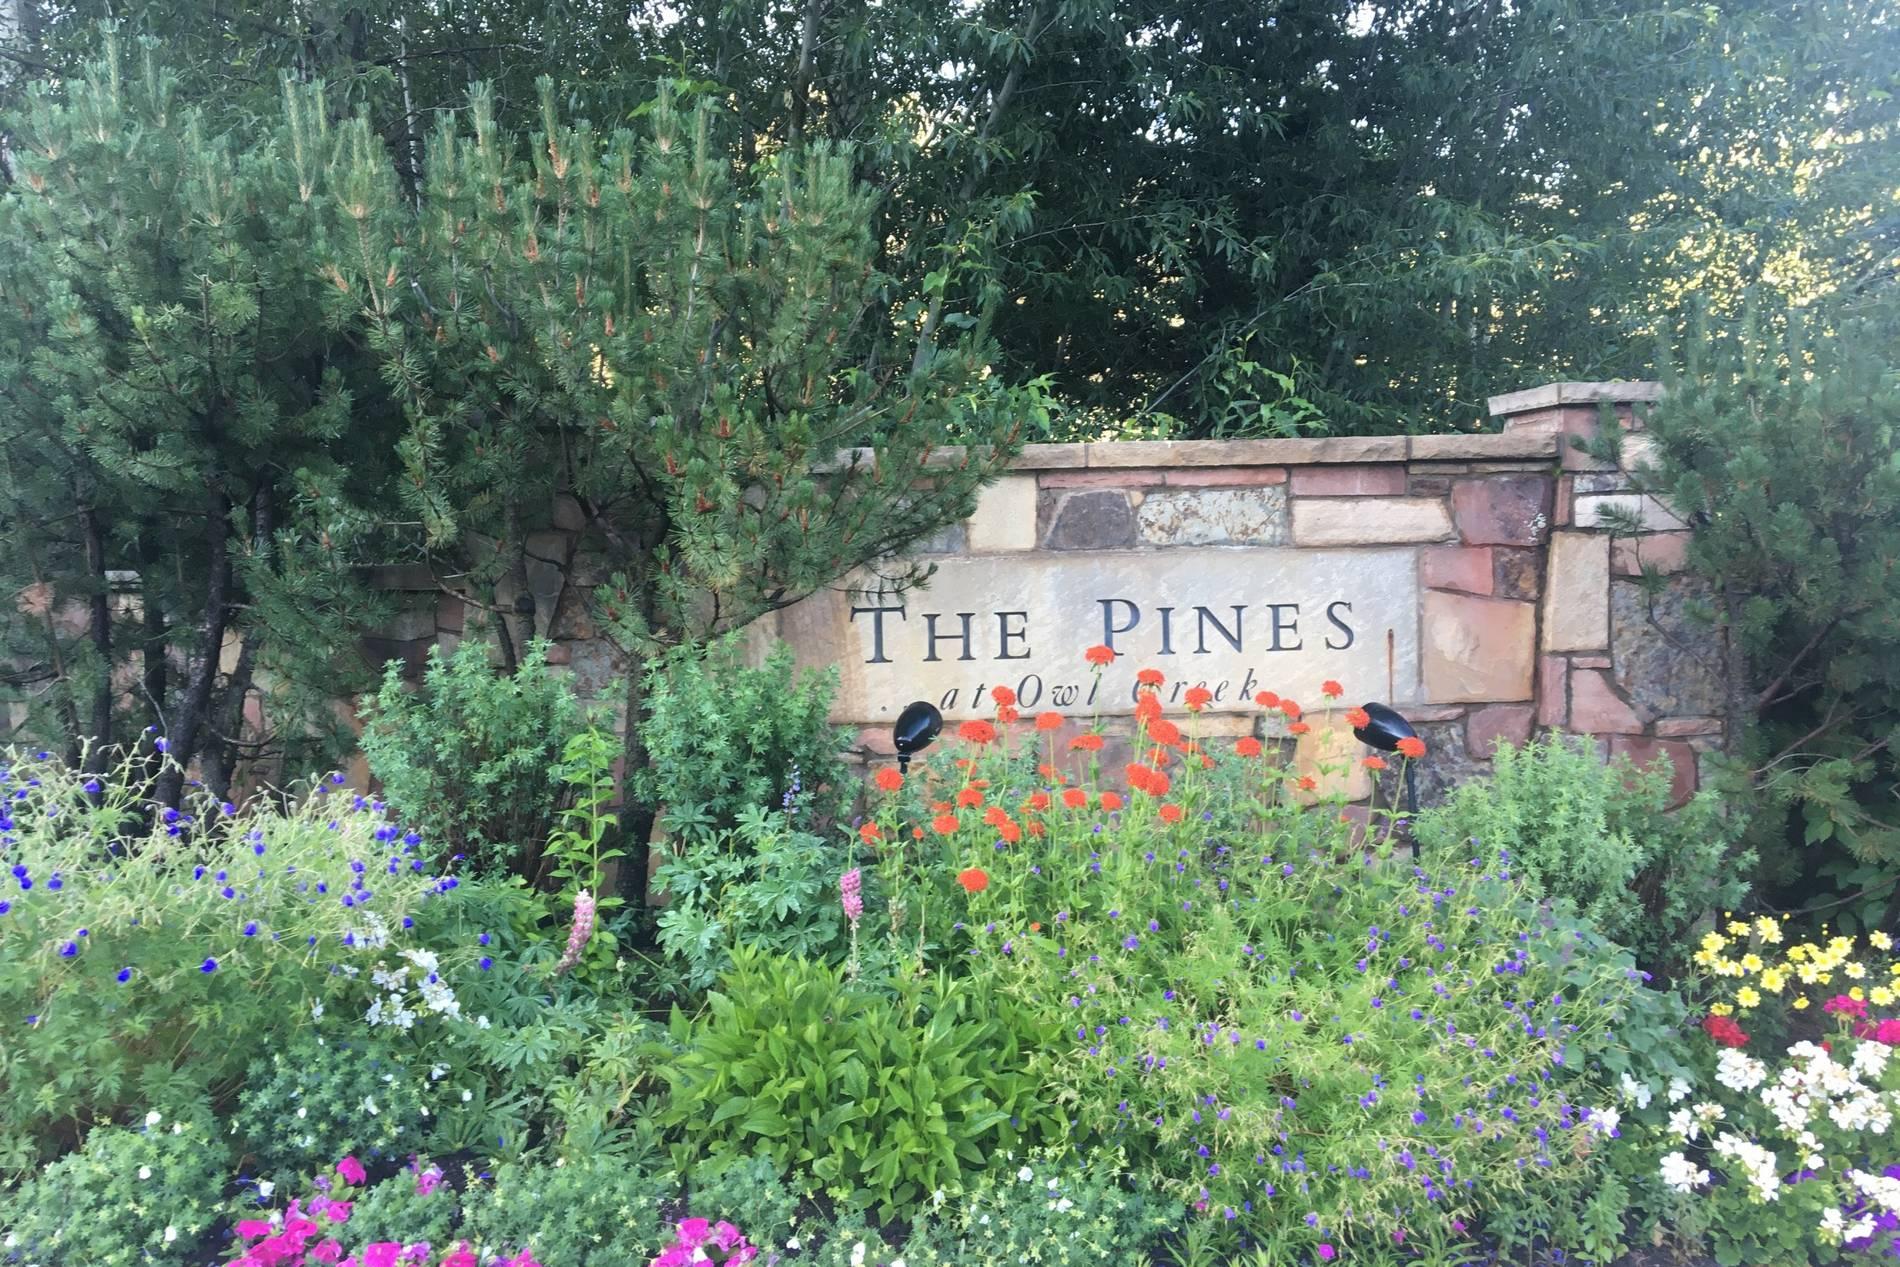 460 Pine Crest Drive Snowmass Village Photo